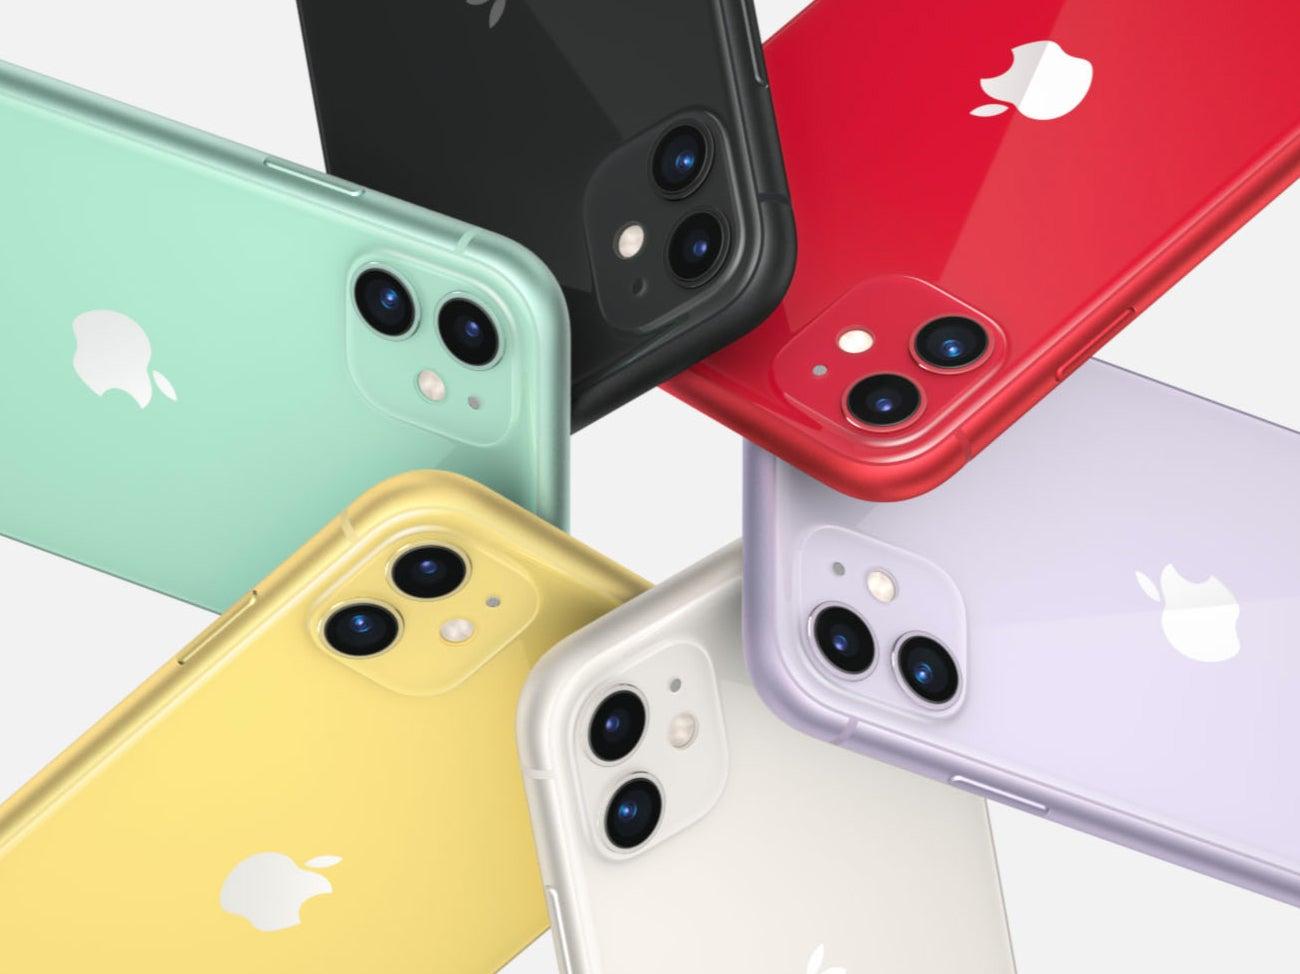 iphone-11-1.jpg